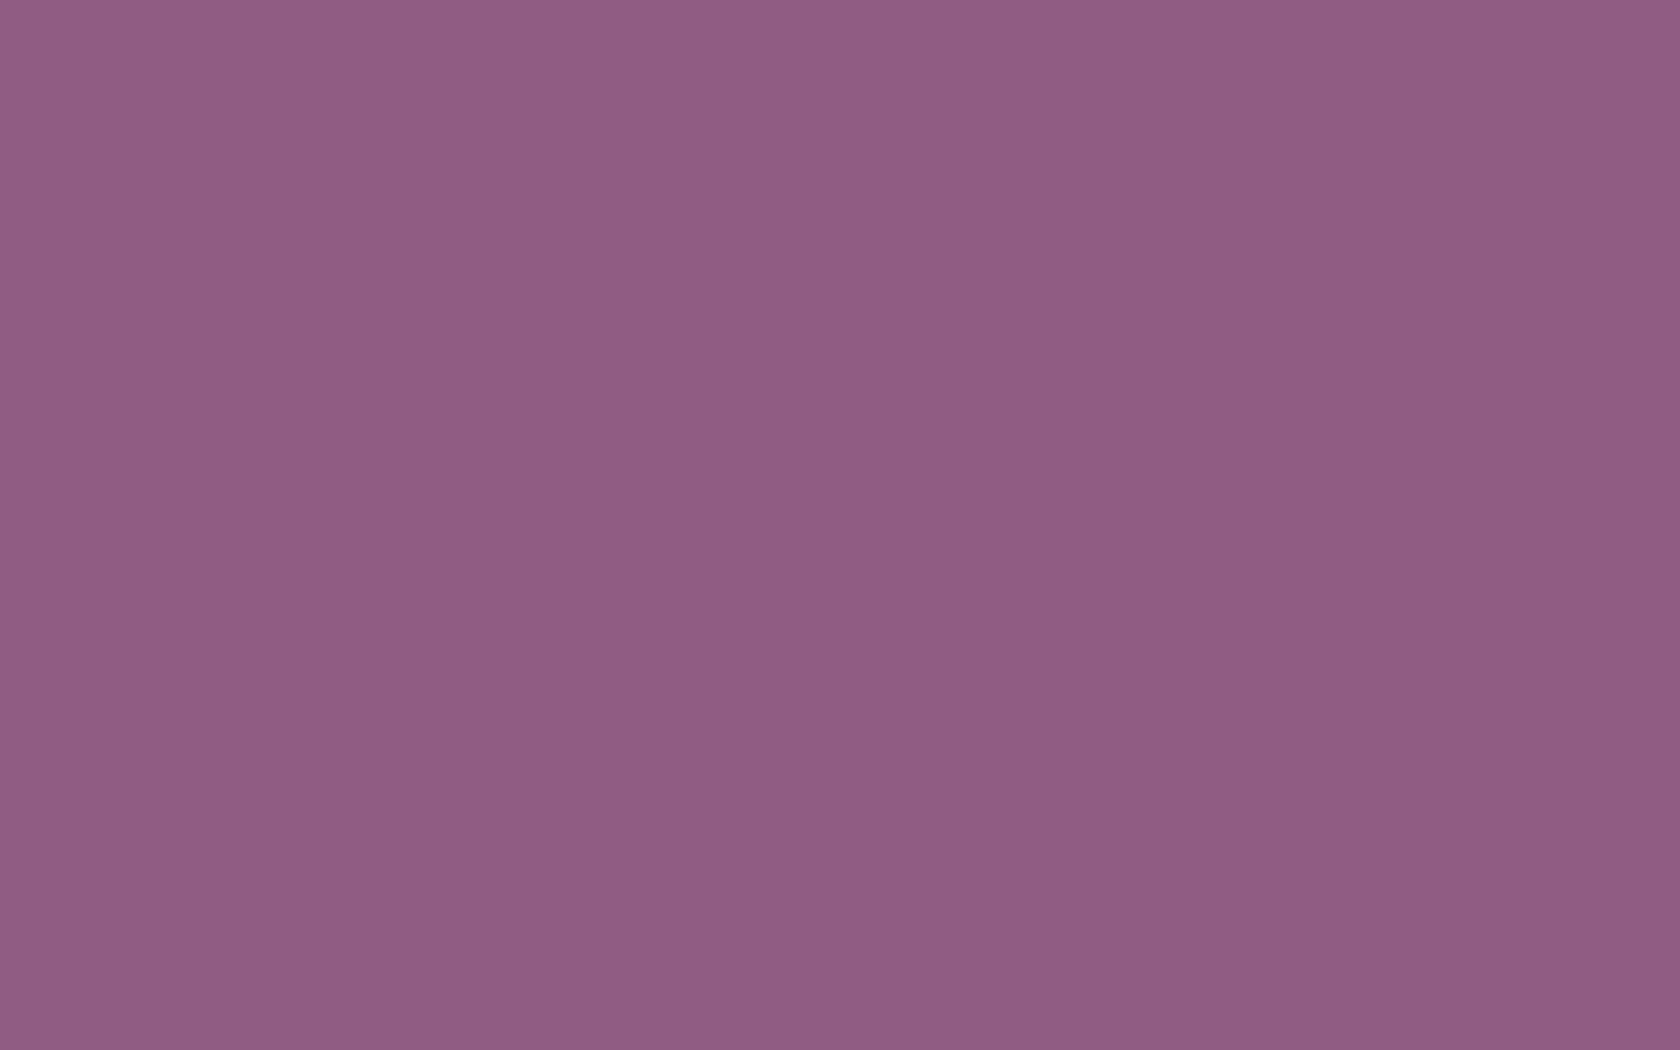 1680x1050 Antique Fuchsia Solid Color Background